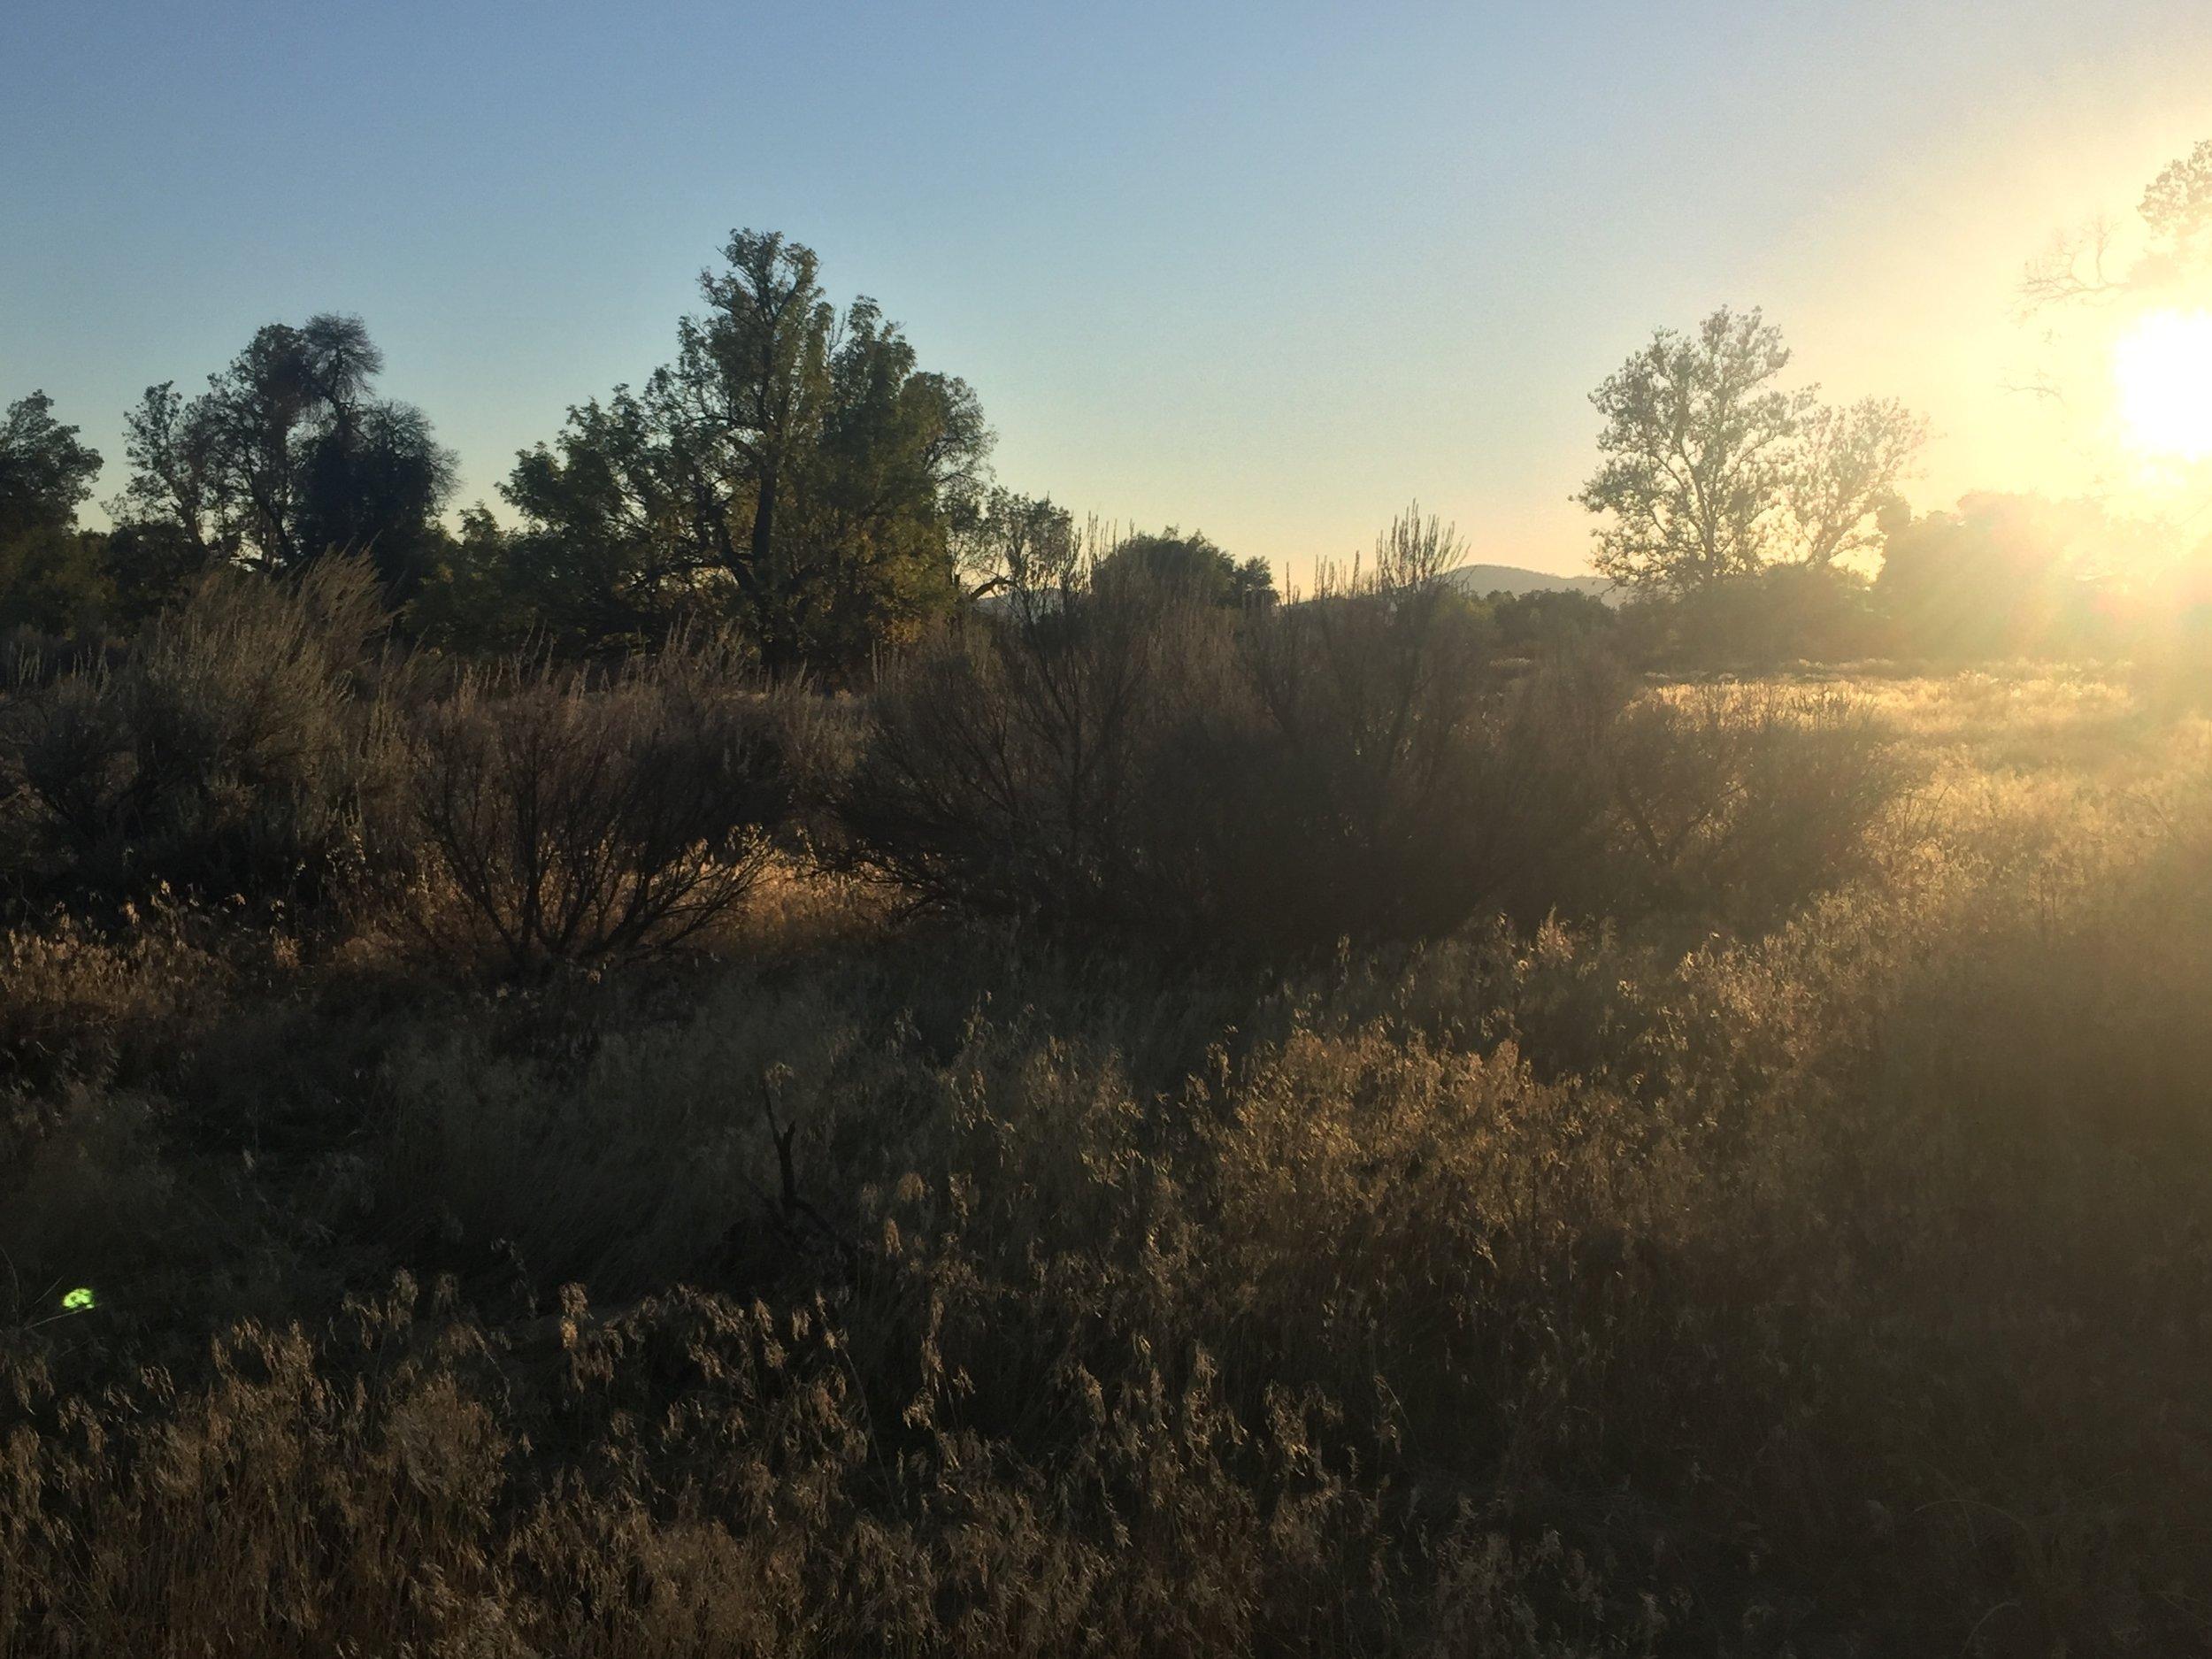 Sunset in the oaks nearing Warner Springs